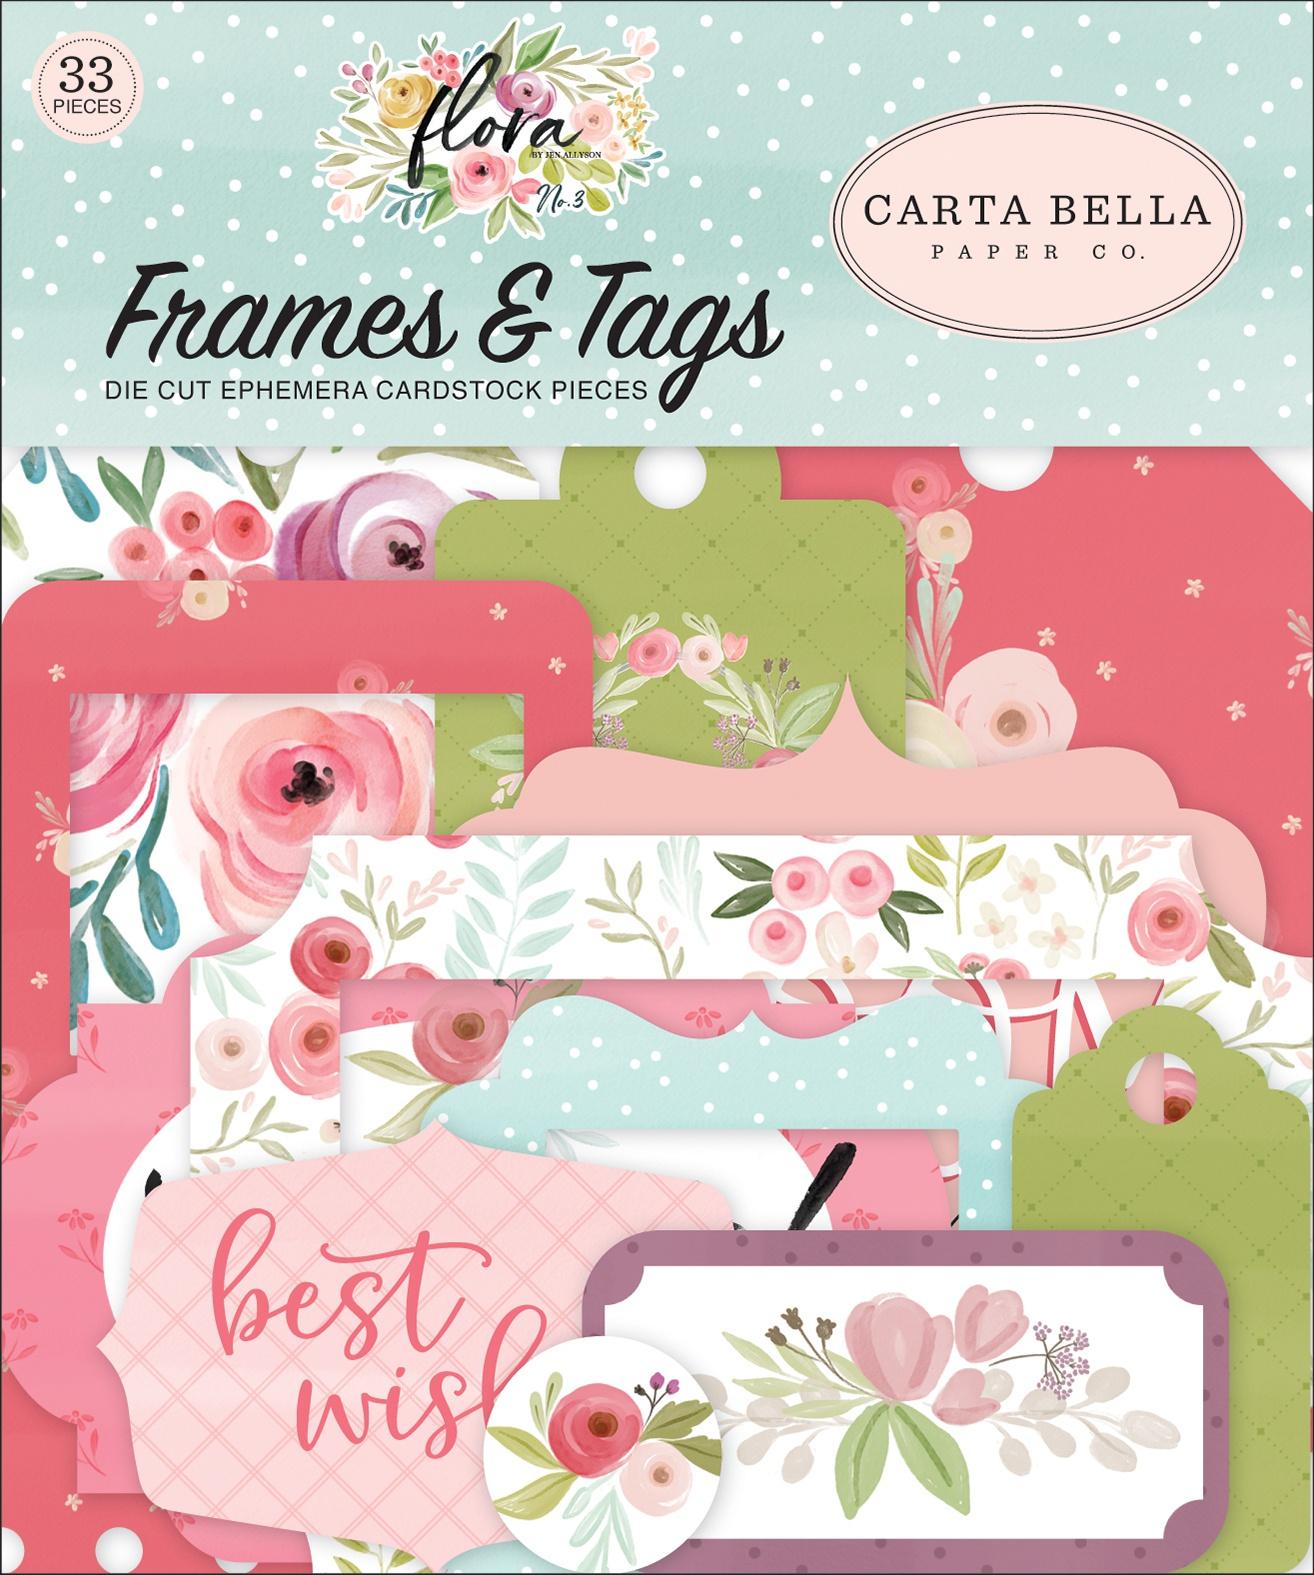 Carta Bella Cardstock Ephemera 33/Pkg-Frames & Tags, Flora No. 3